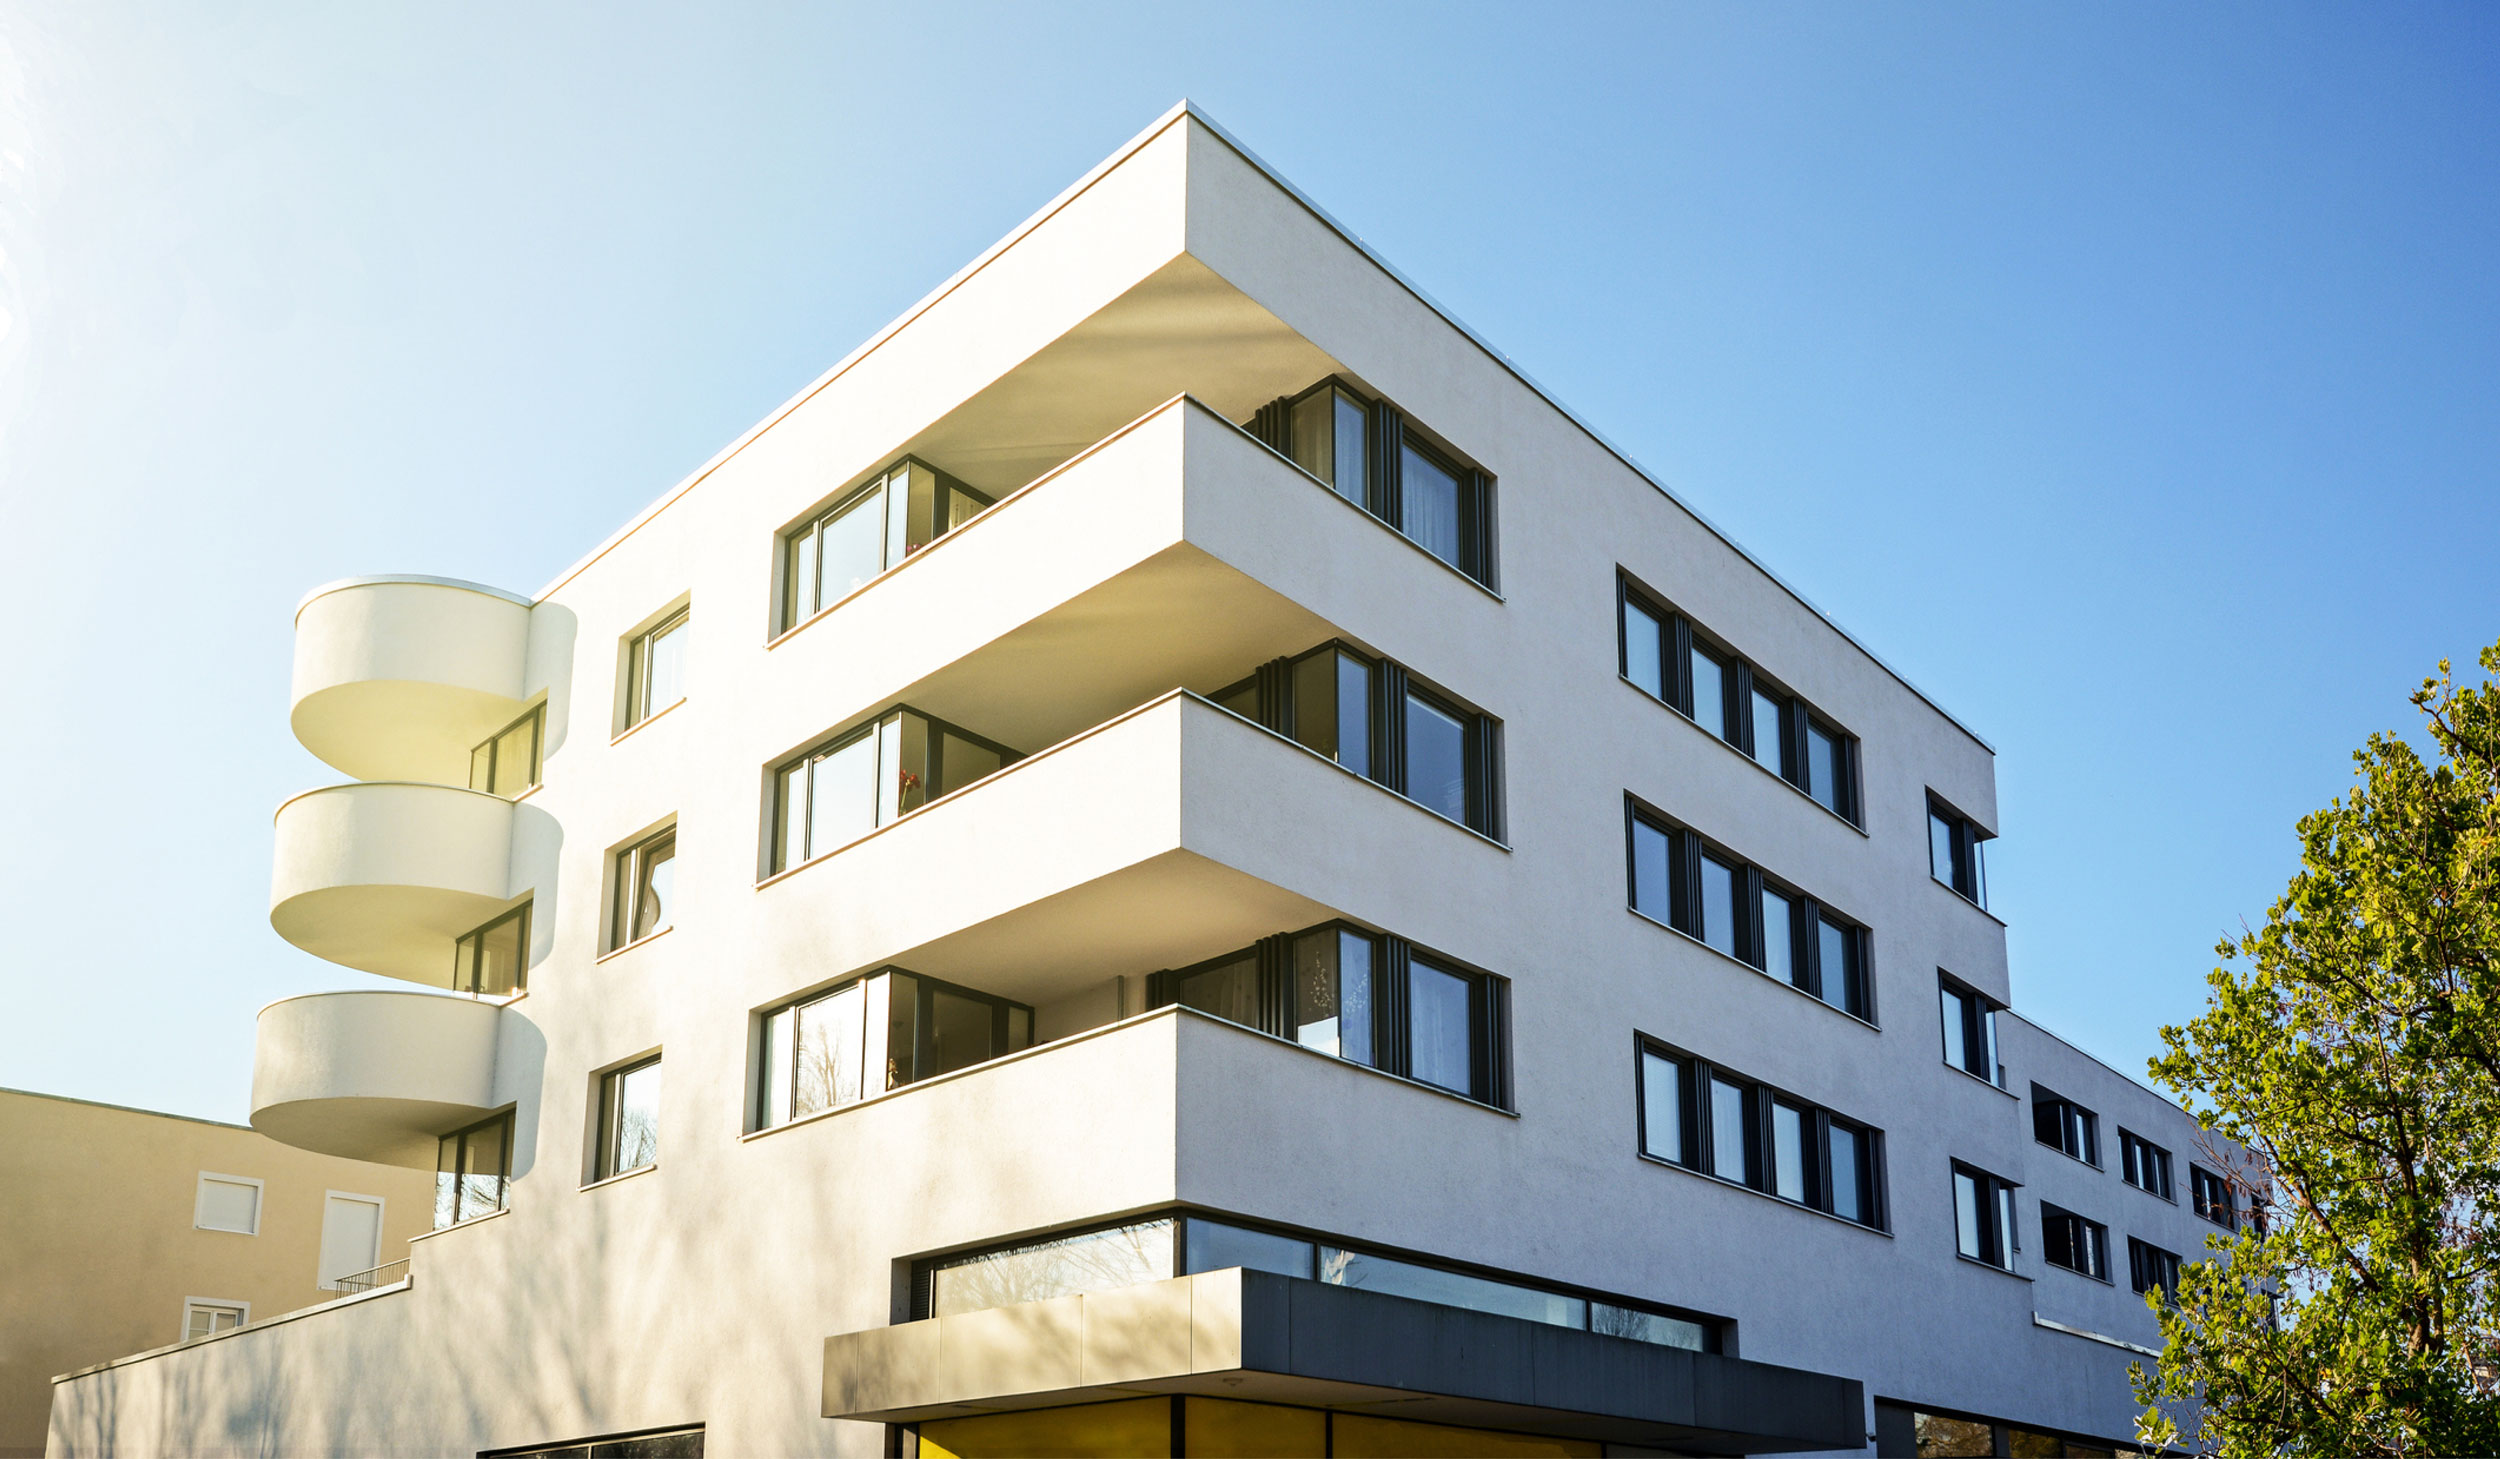 Backes & Backes Rechtsanwälte Immobilienrecht